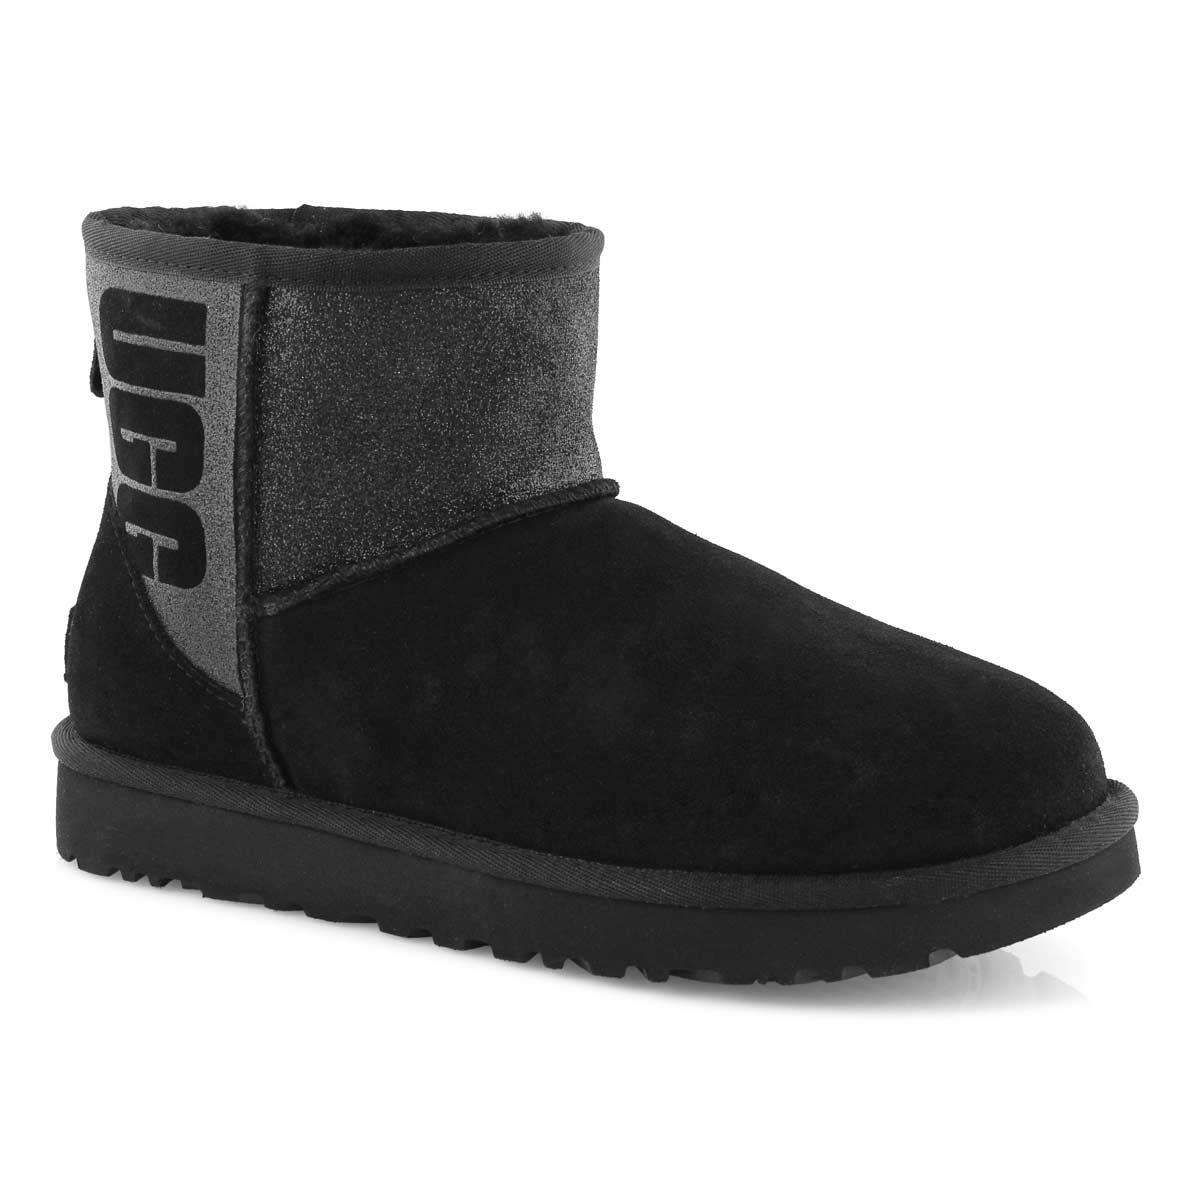 Women's CLASSIC MINI UGG SPARKLE blk boots